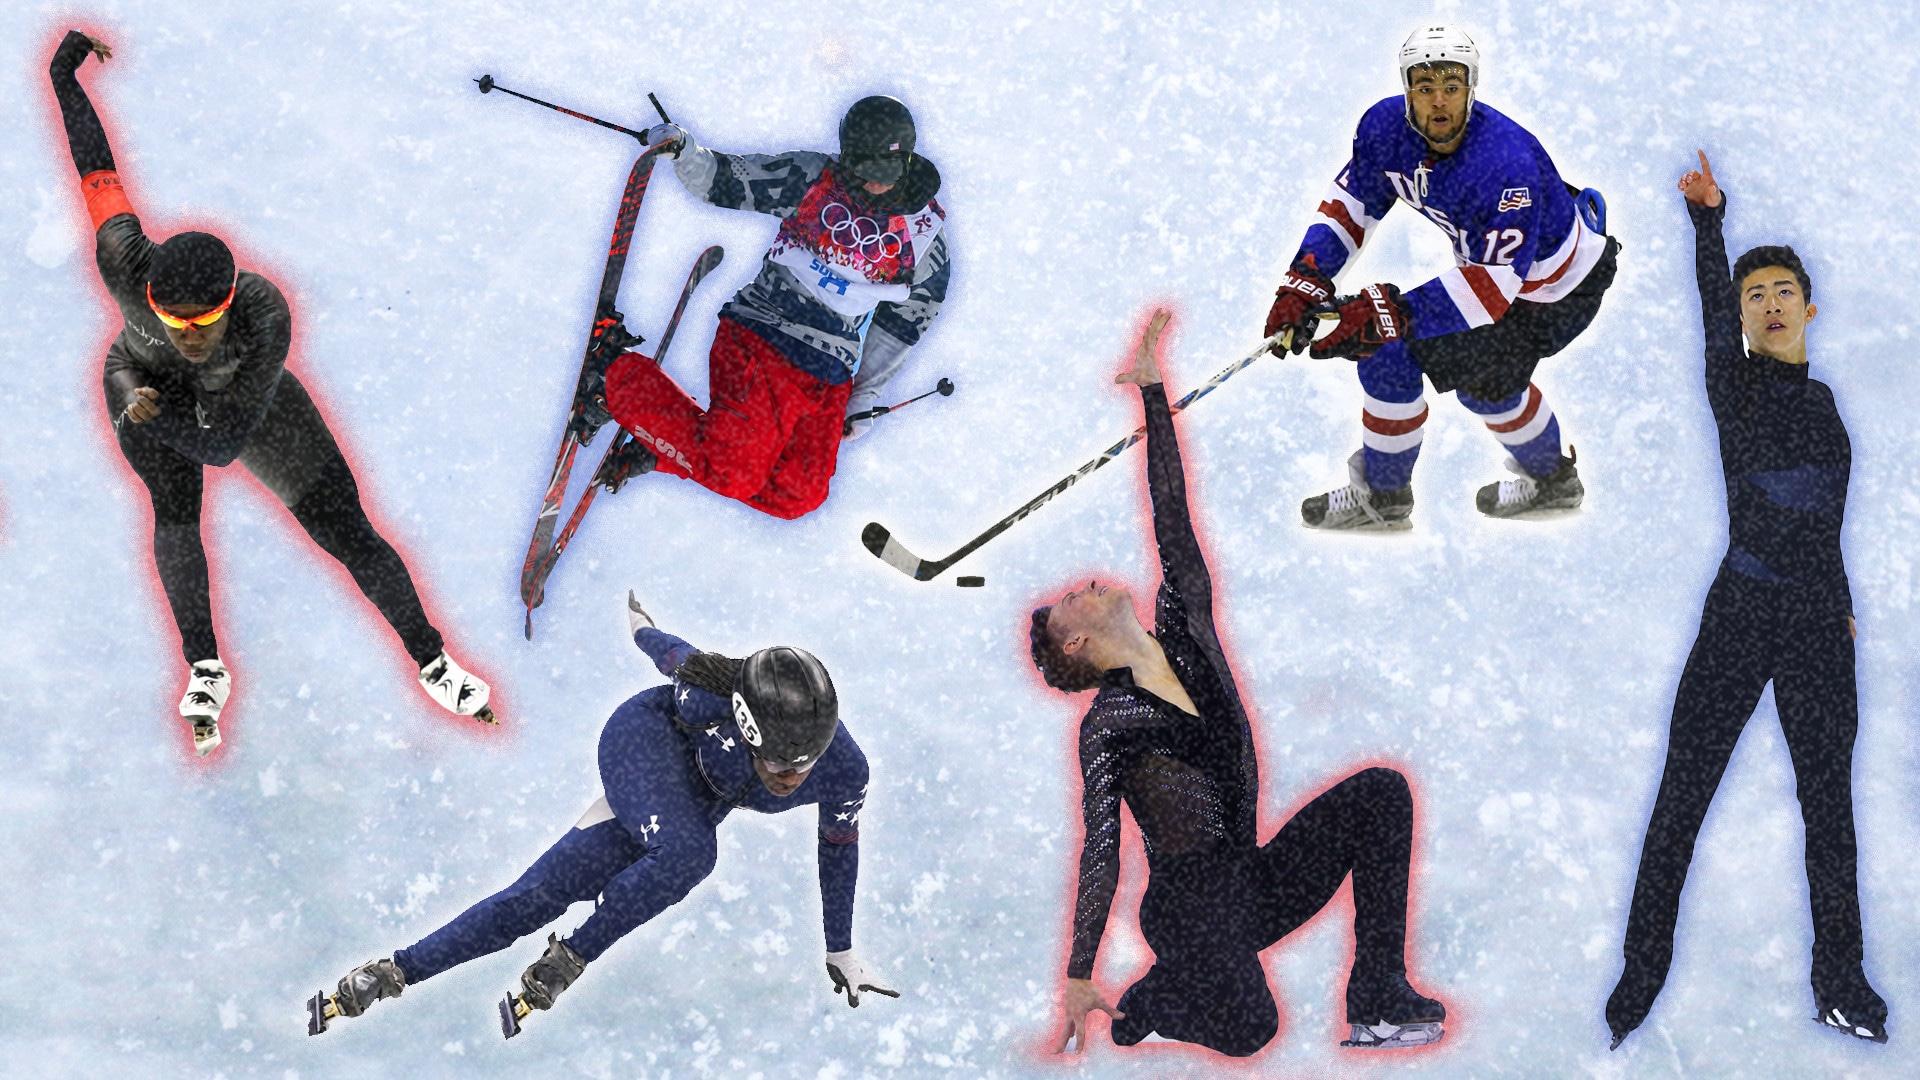 Olympics, Team USA, Diversity